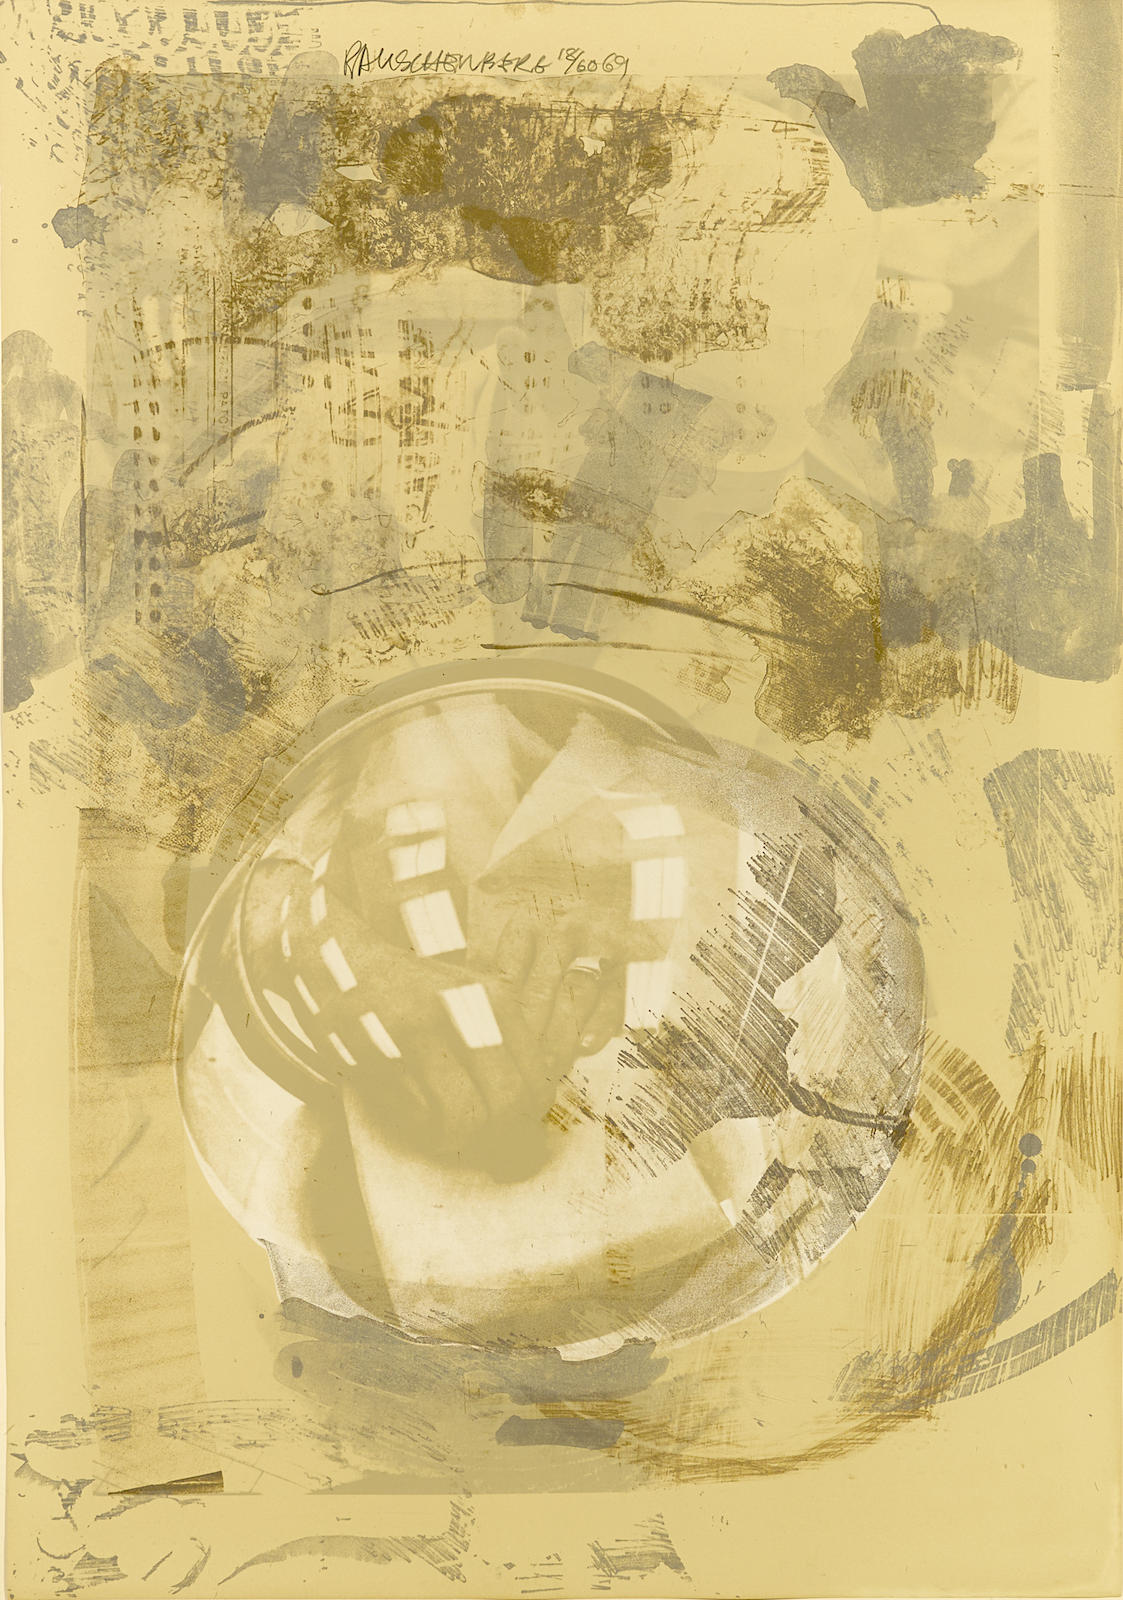 Robert Rauschenberg-Sack, from Stoned Moon Series (G. 166)-1969